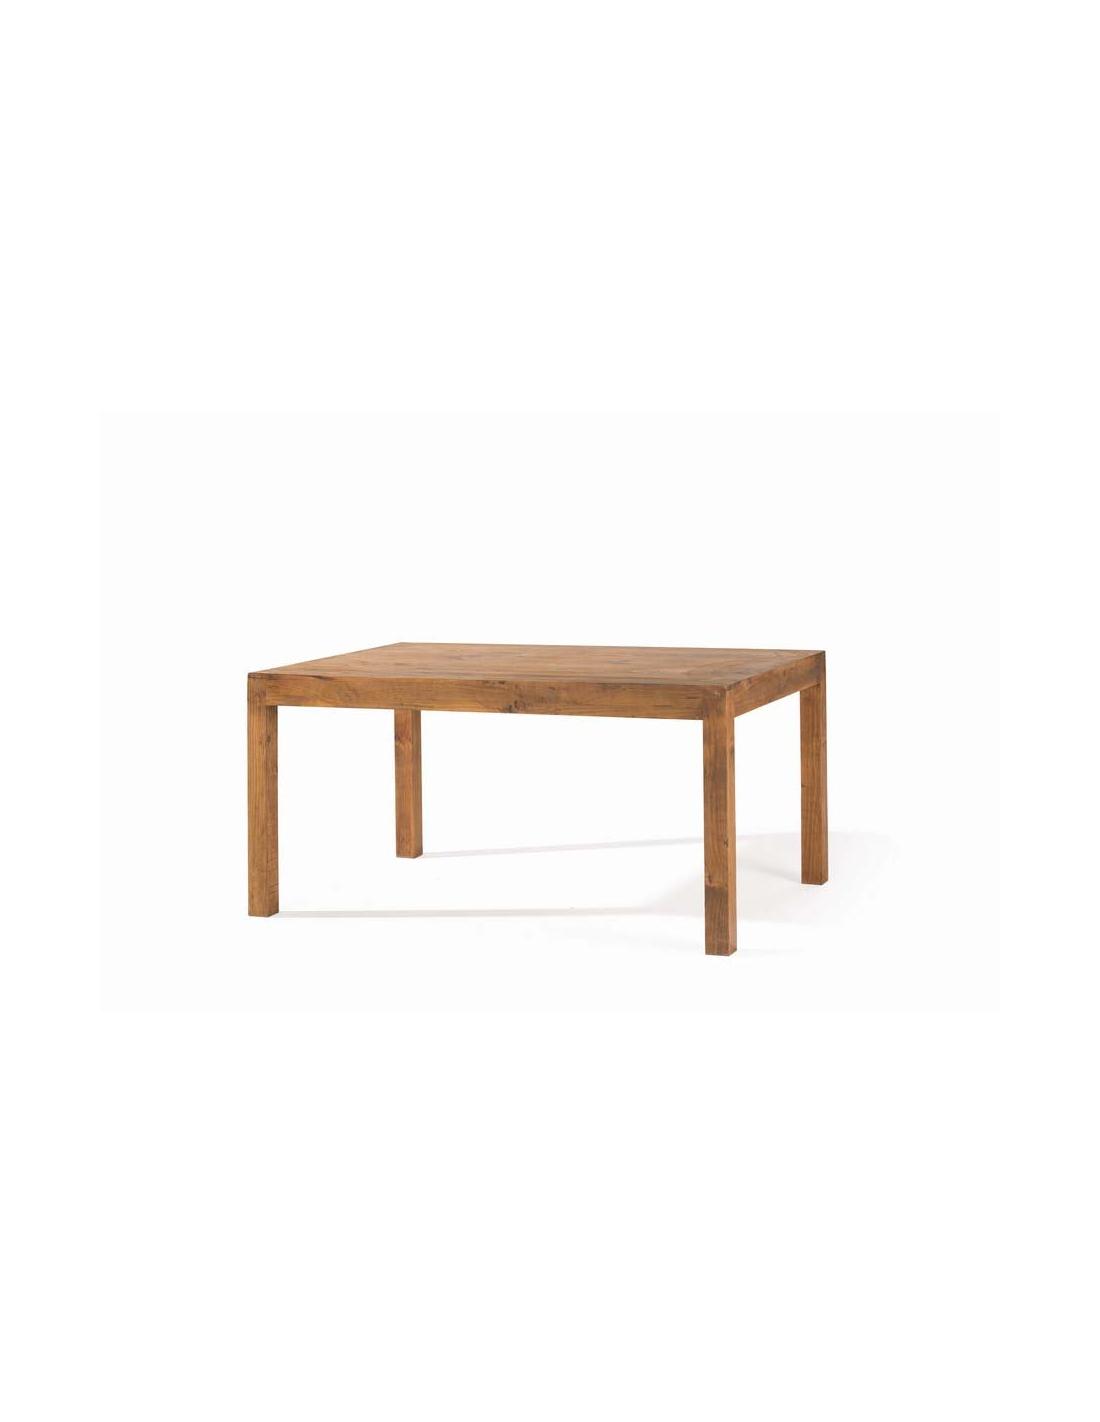 Comprar mesa de comedor rustica rectangular fija minimal for Mesas rusticas comedor